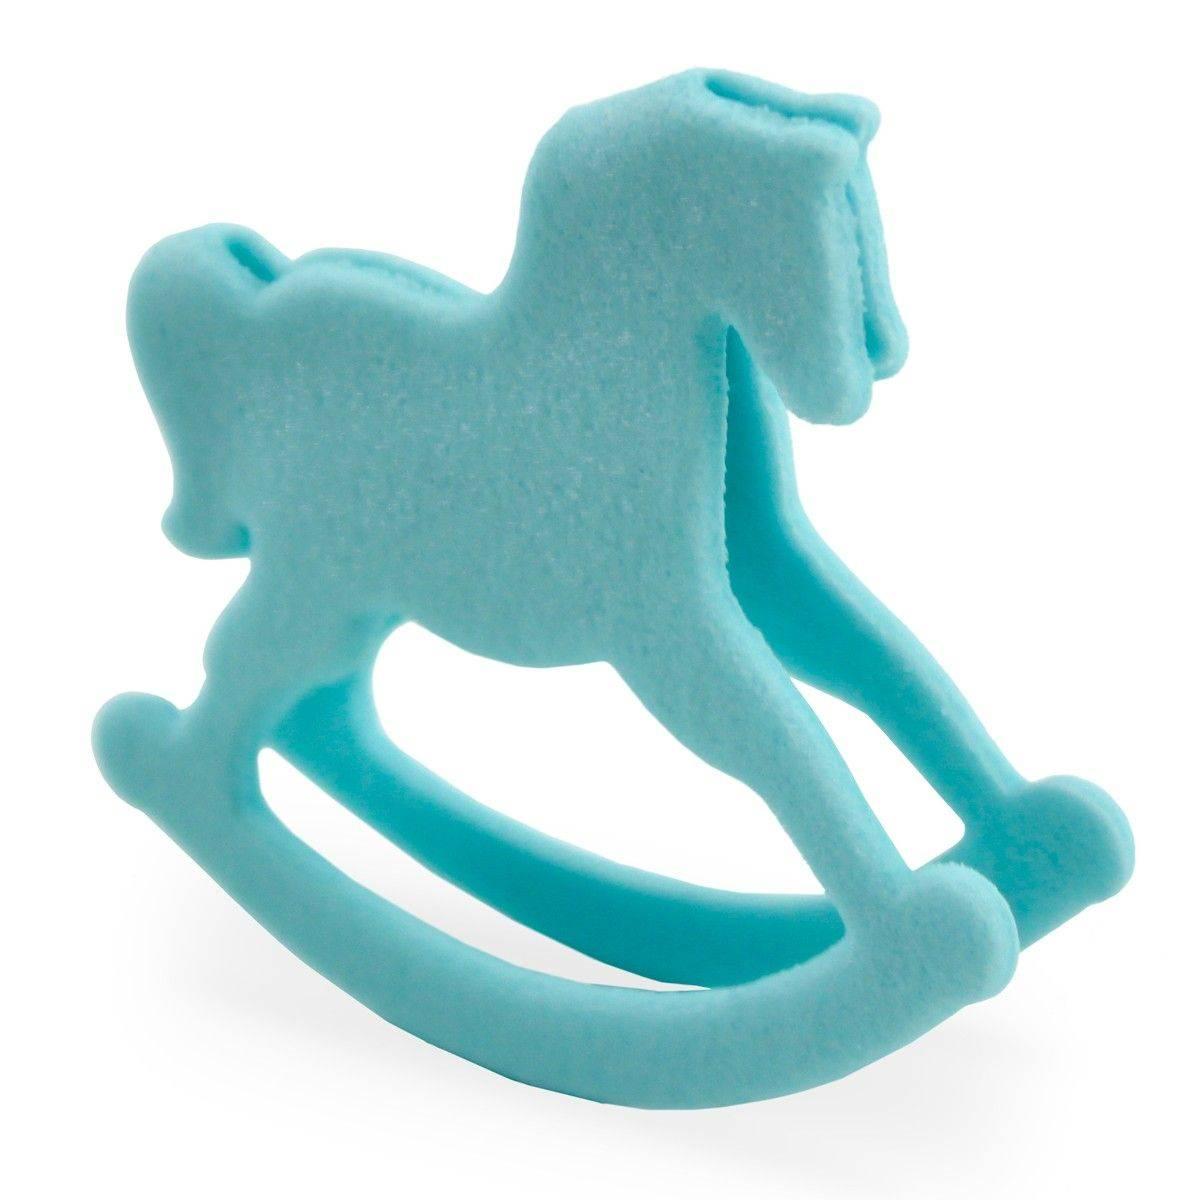 Blue Rocking Horse Sugar Baby Planete Gateau